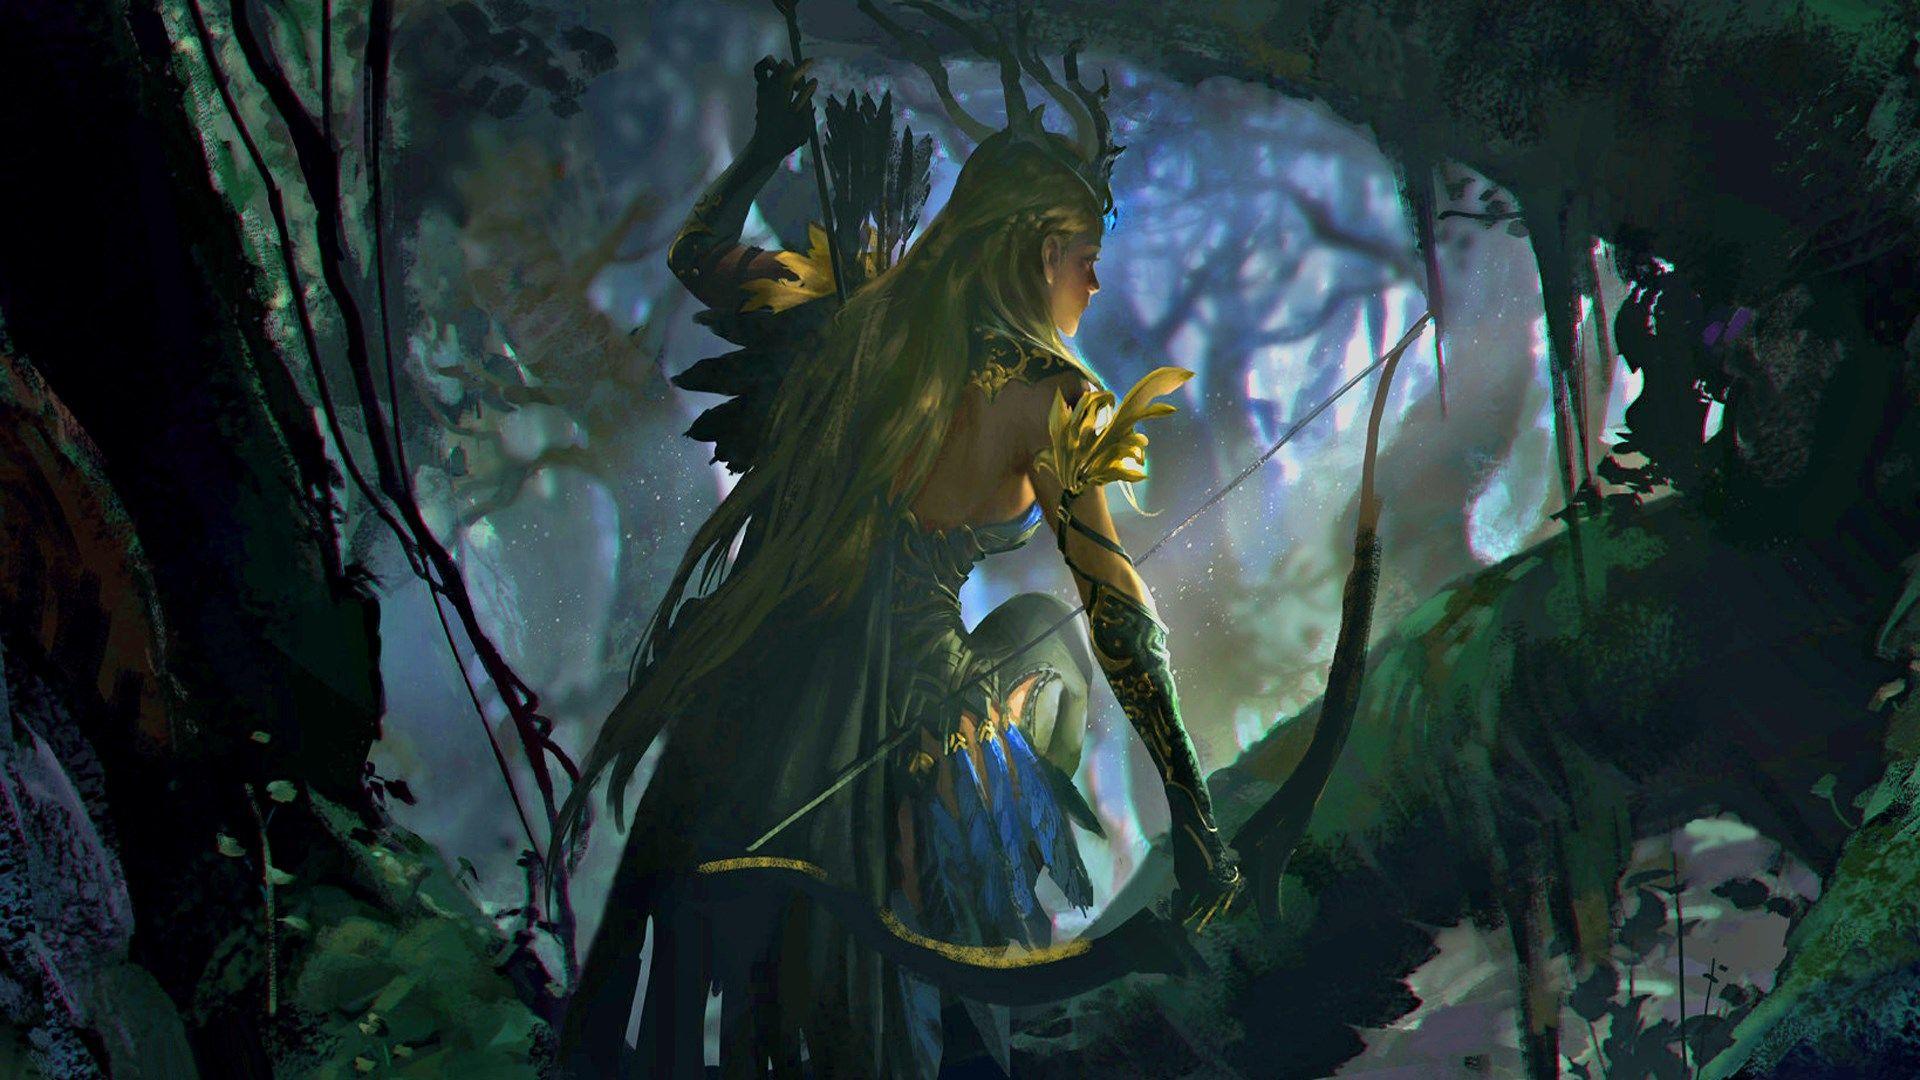 Pictures Of Elf Elf Category Pictures Of Elves Wallpaper Backgrounds Elf